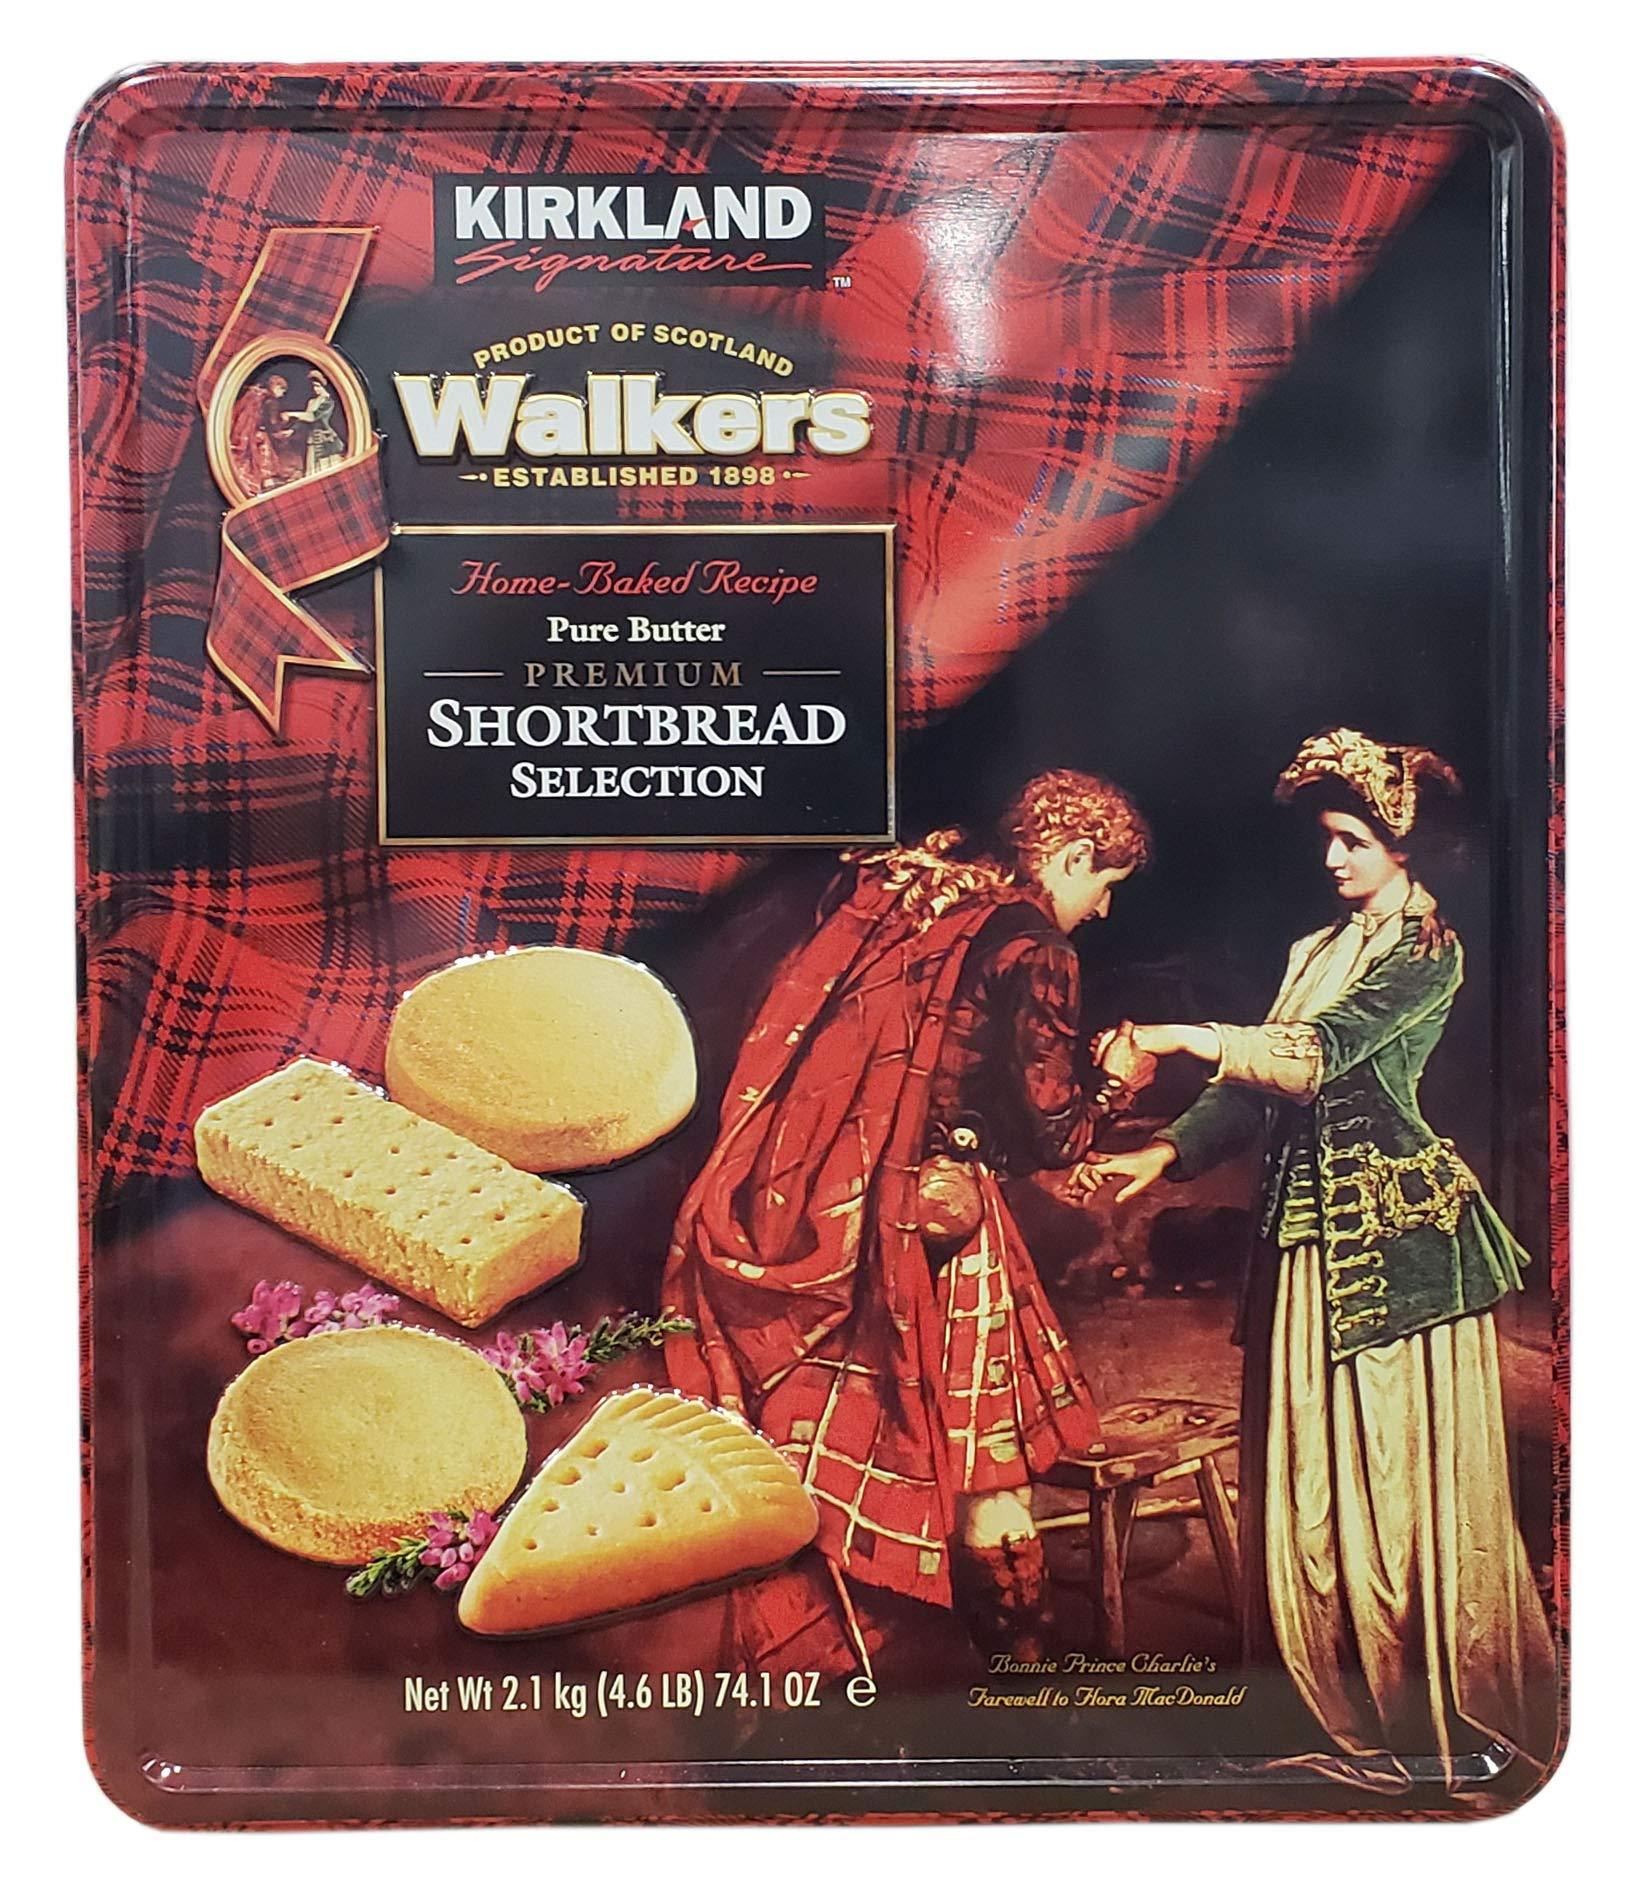 Kirkland Signature Walkers Premium Shortbread Selection Gift Tin, 4.6 Pound